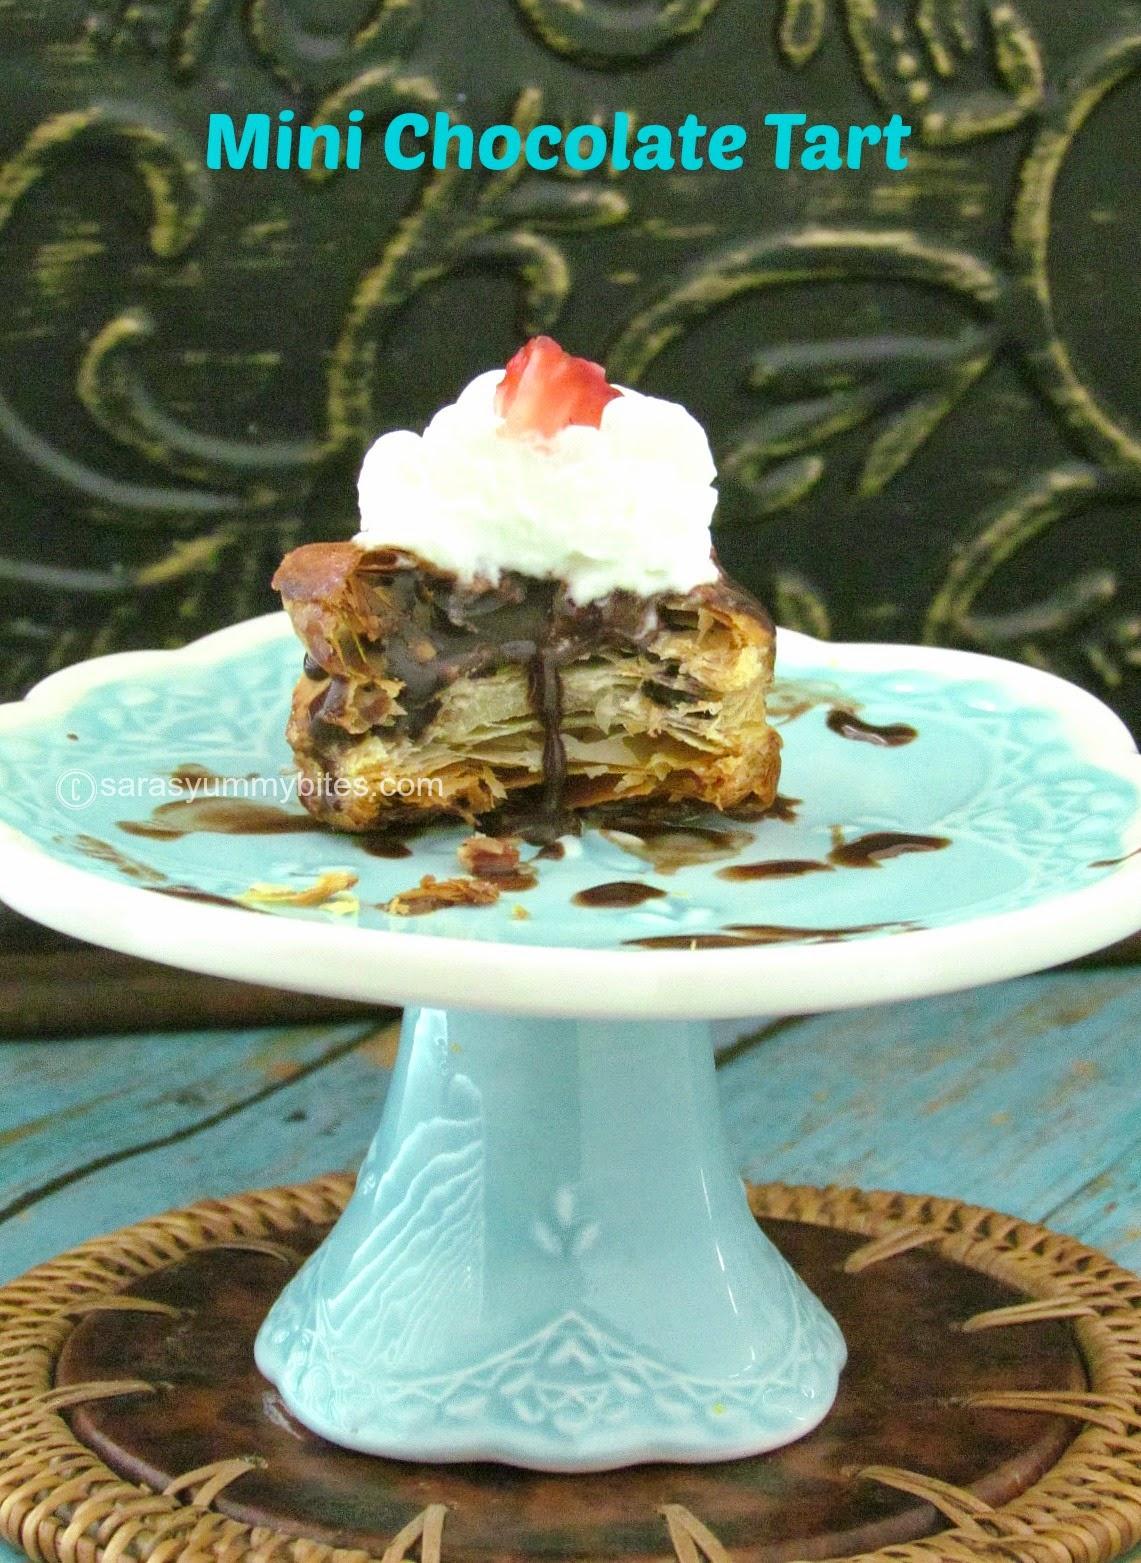 Mini Chocolate Tart